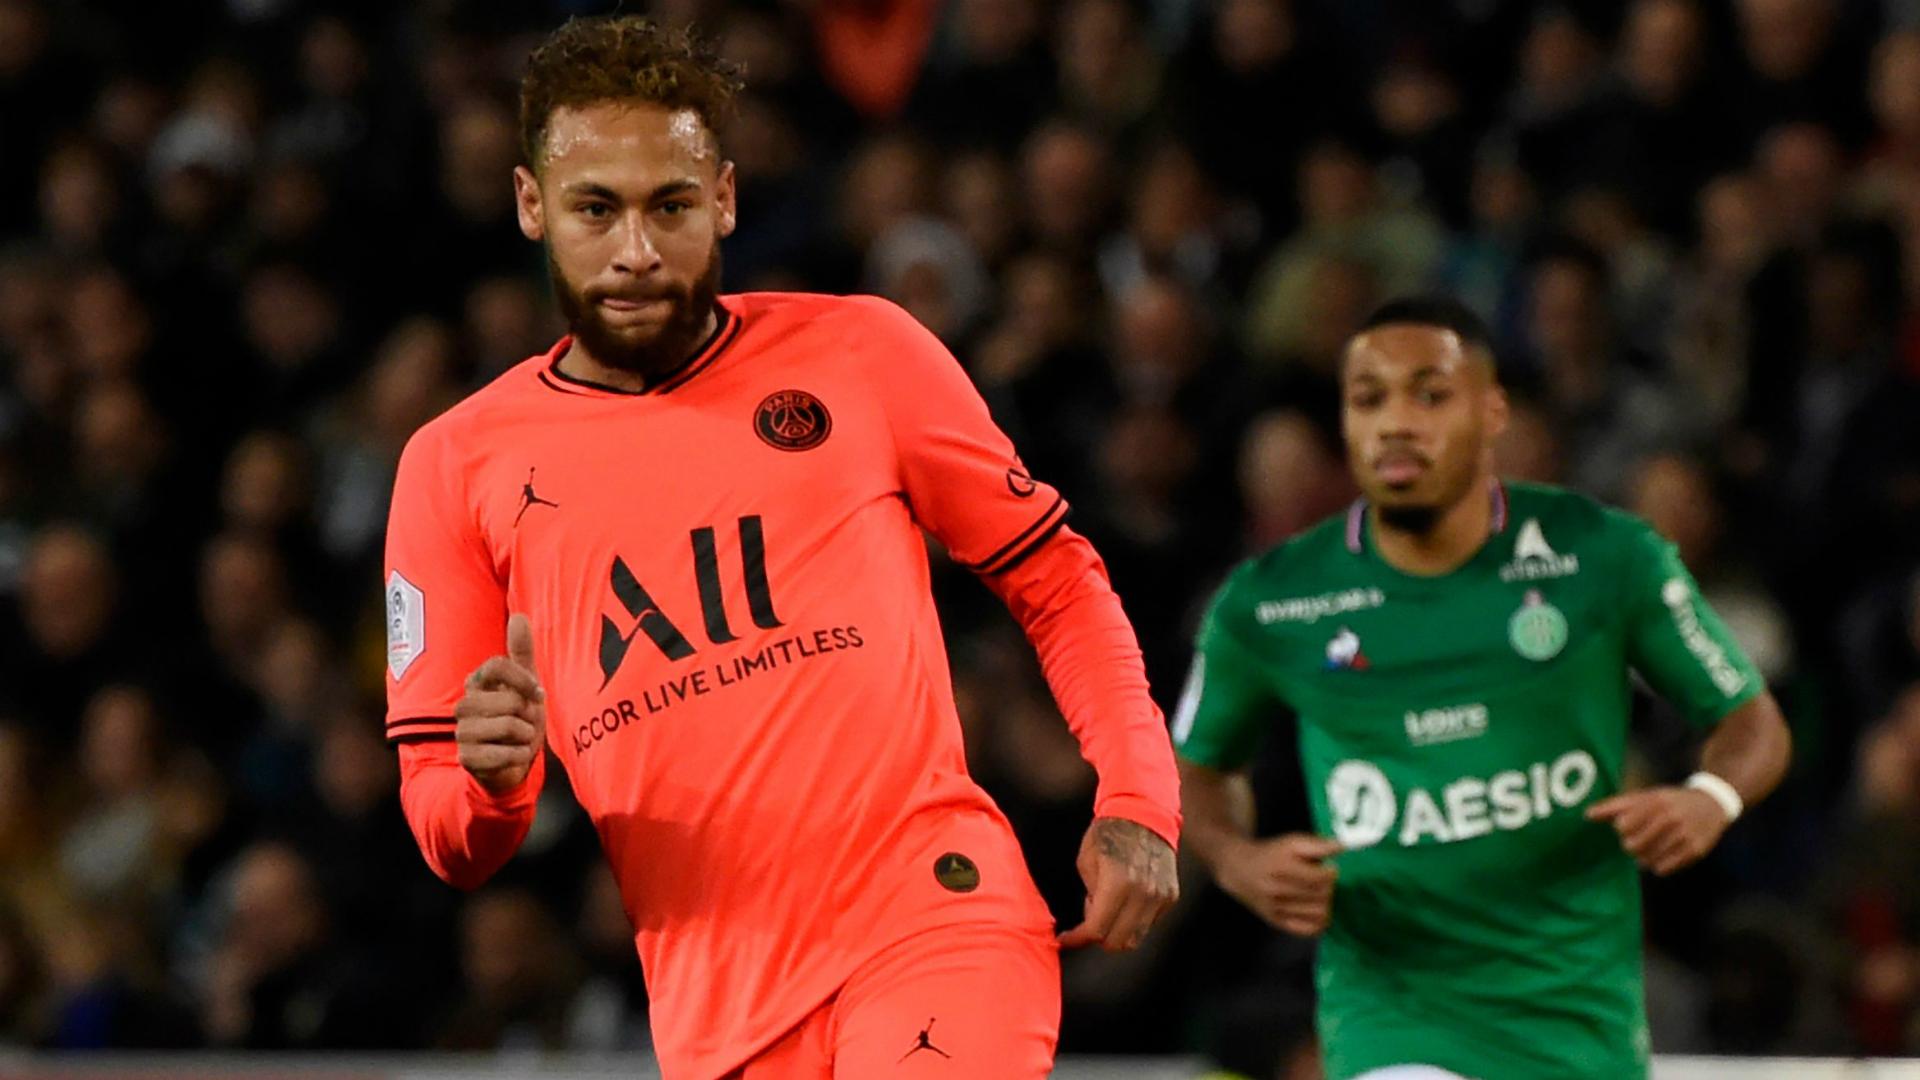 Neymar's desire praised by Leonardo amid ongoing doubts over PSG future